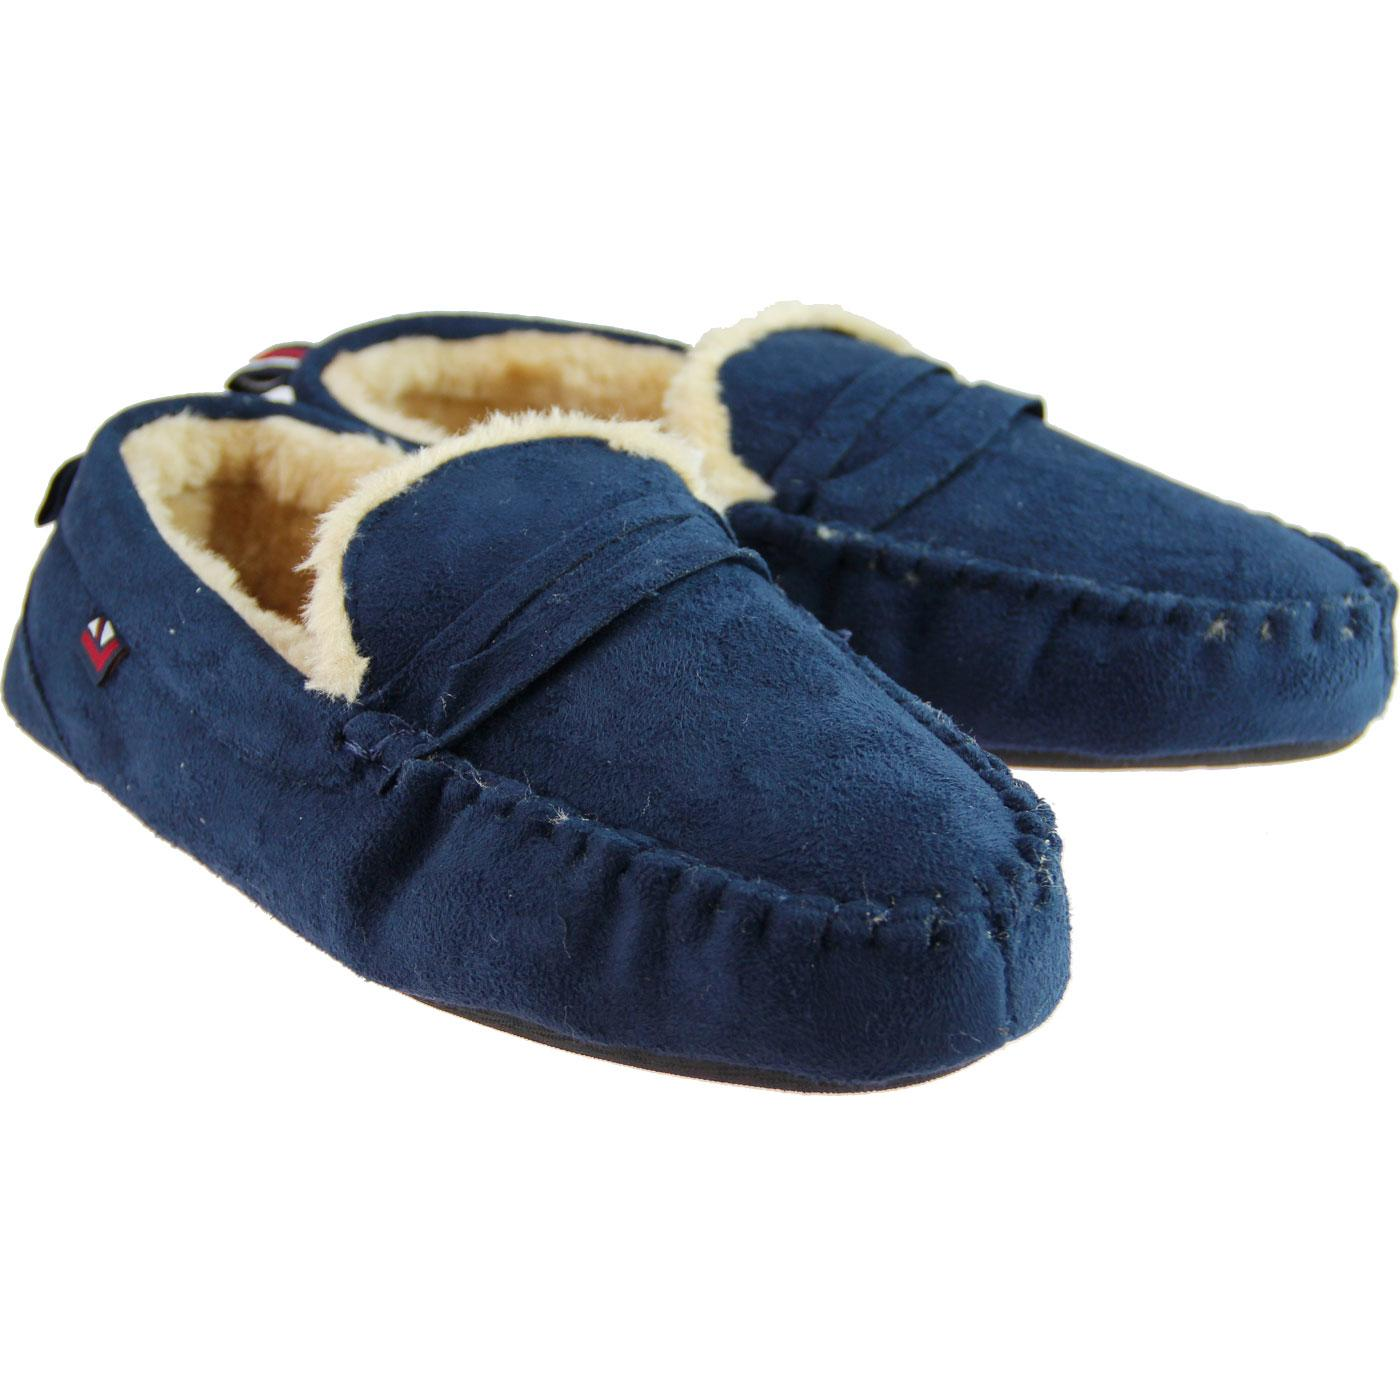 5f574130066c BEN SHERMAN Four Seasons Mod Moccasin Slippers is Navy